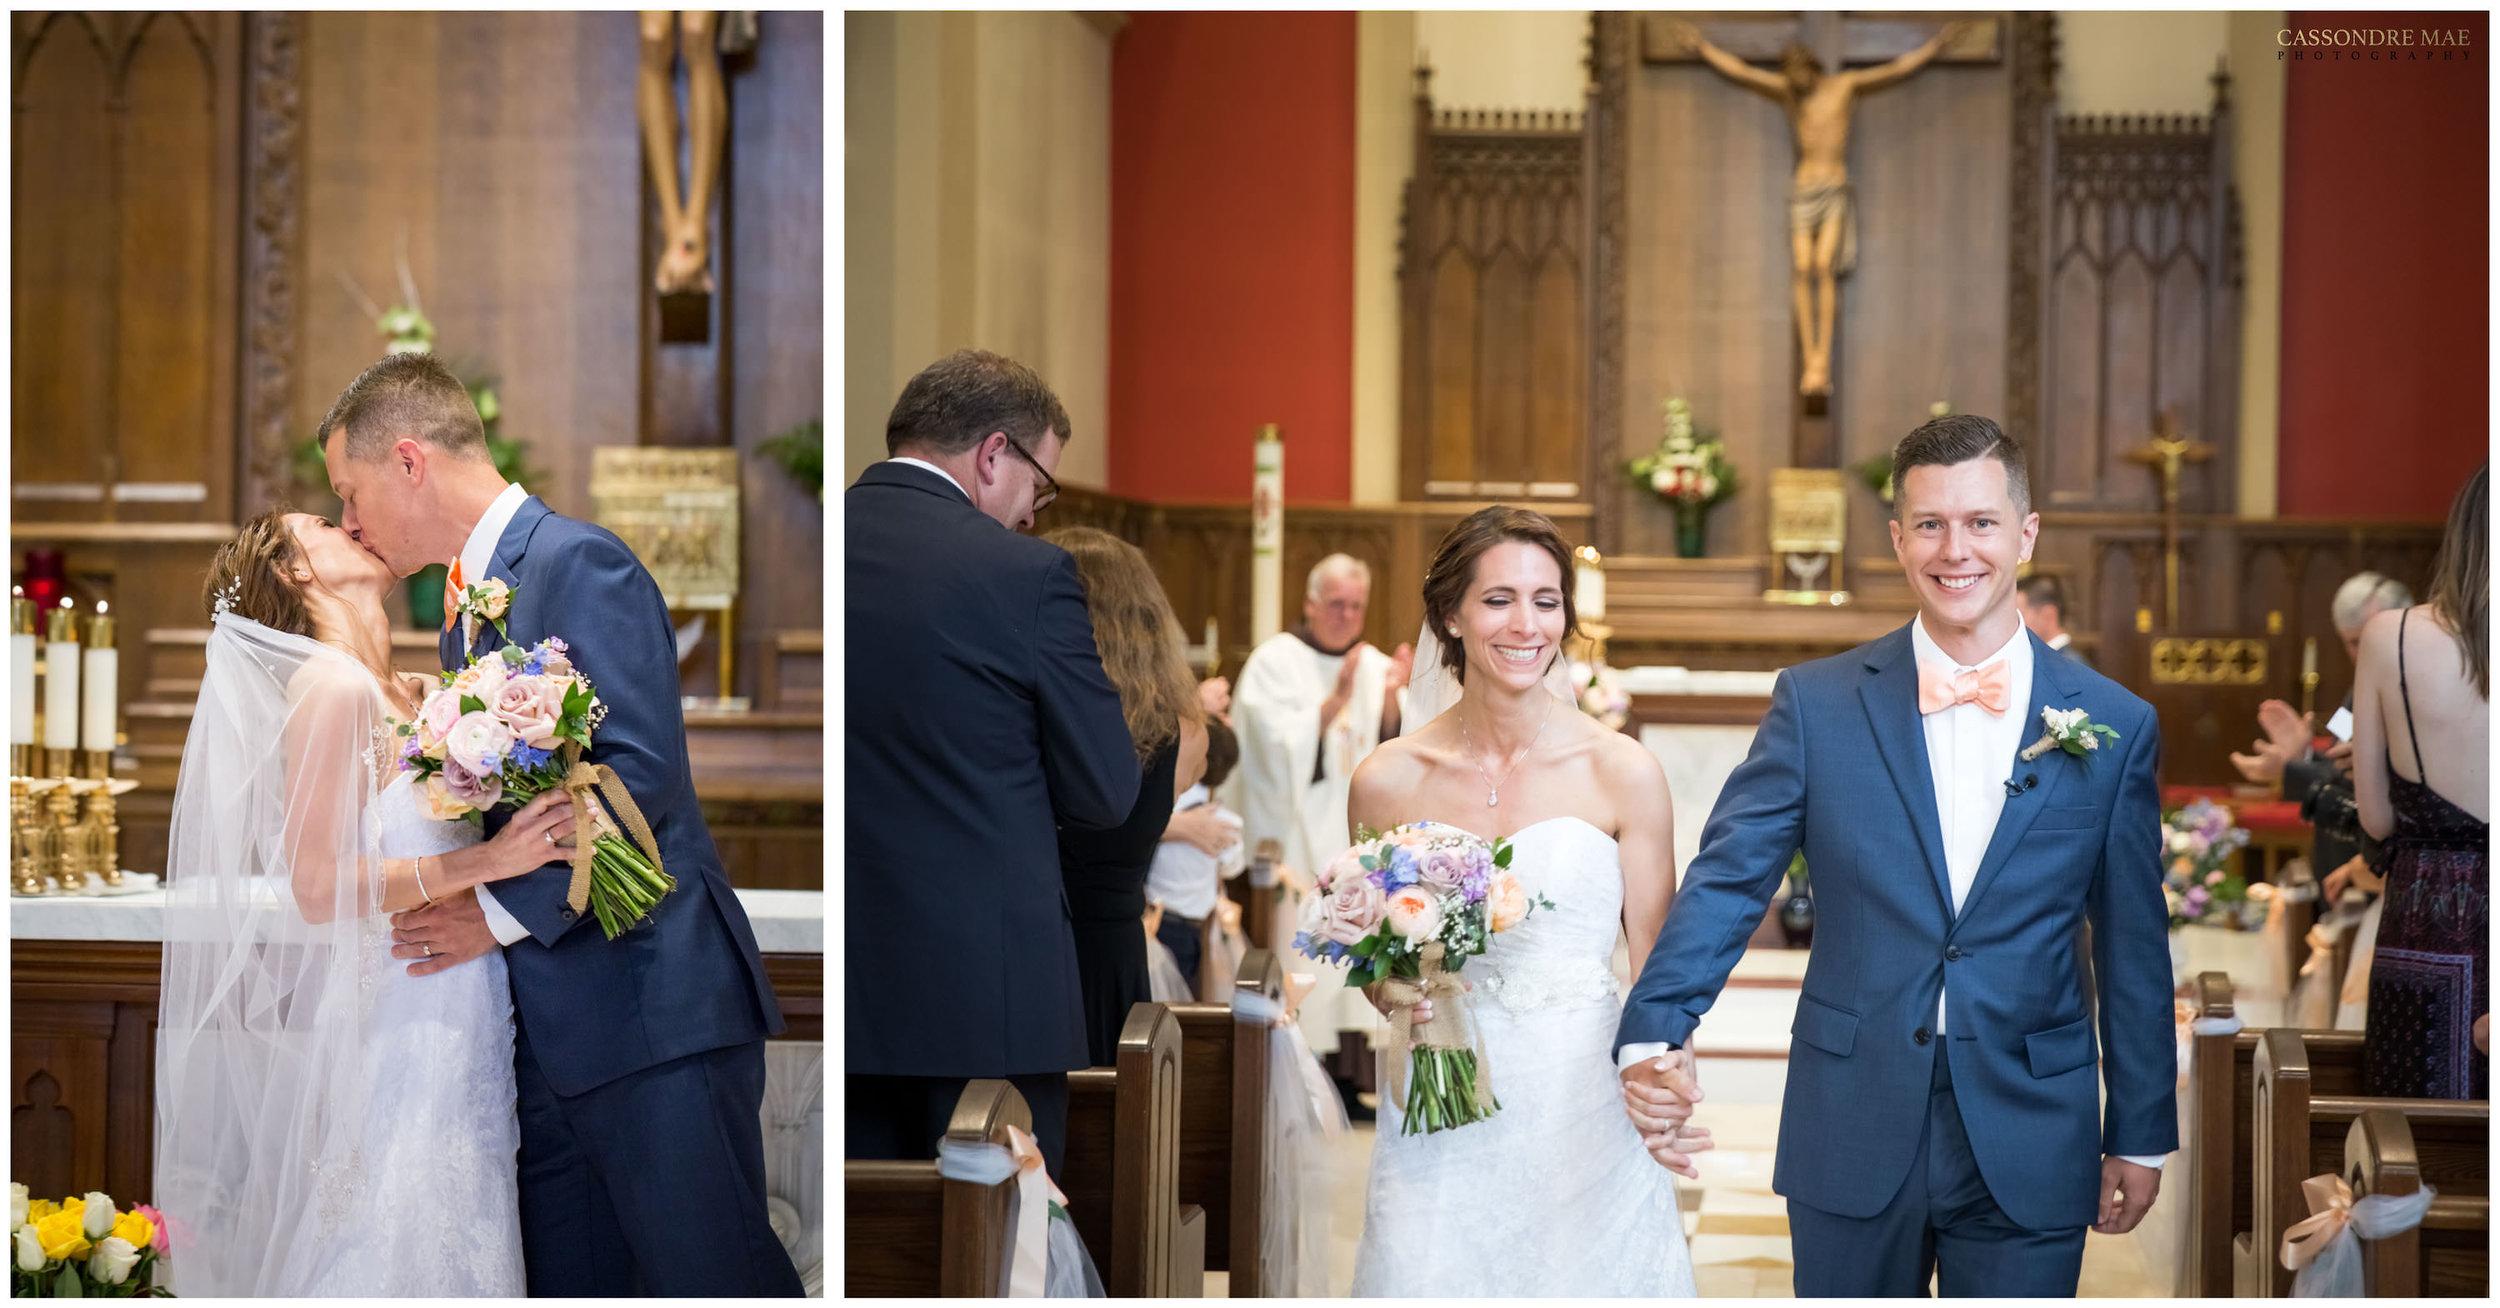 Cassondre Mae Photography Links at Unionvale Wedding 6.jpg